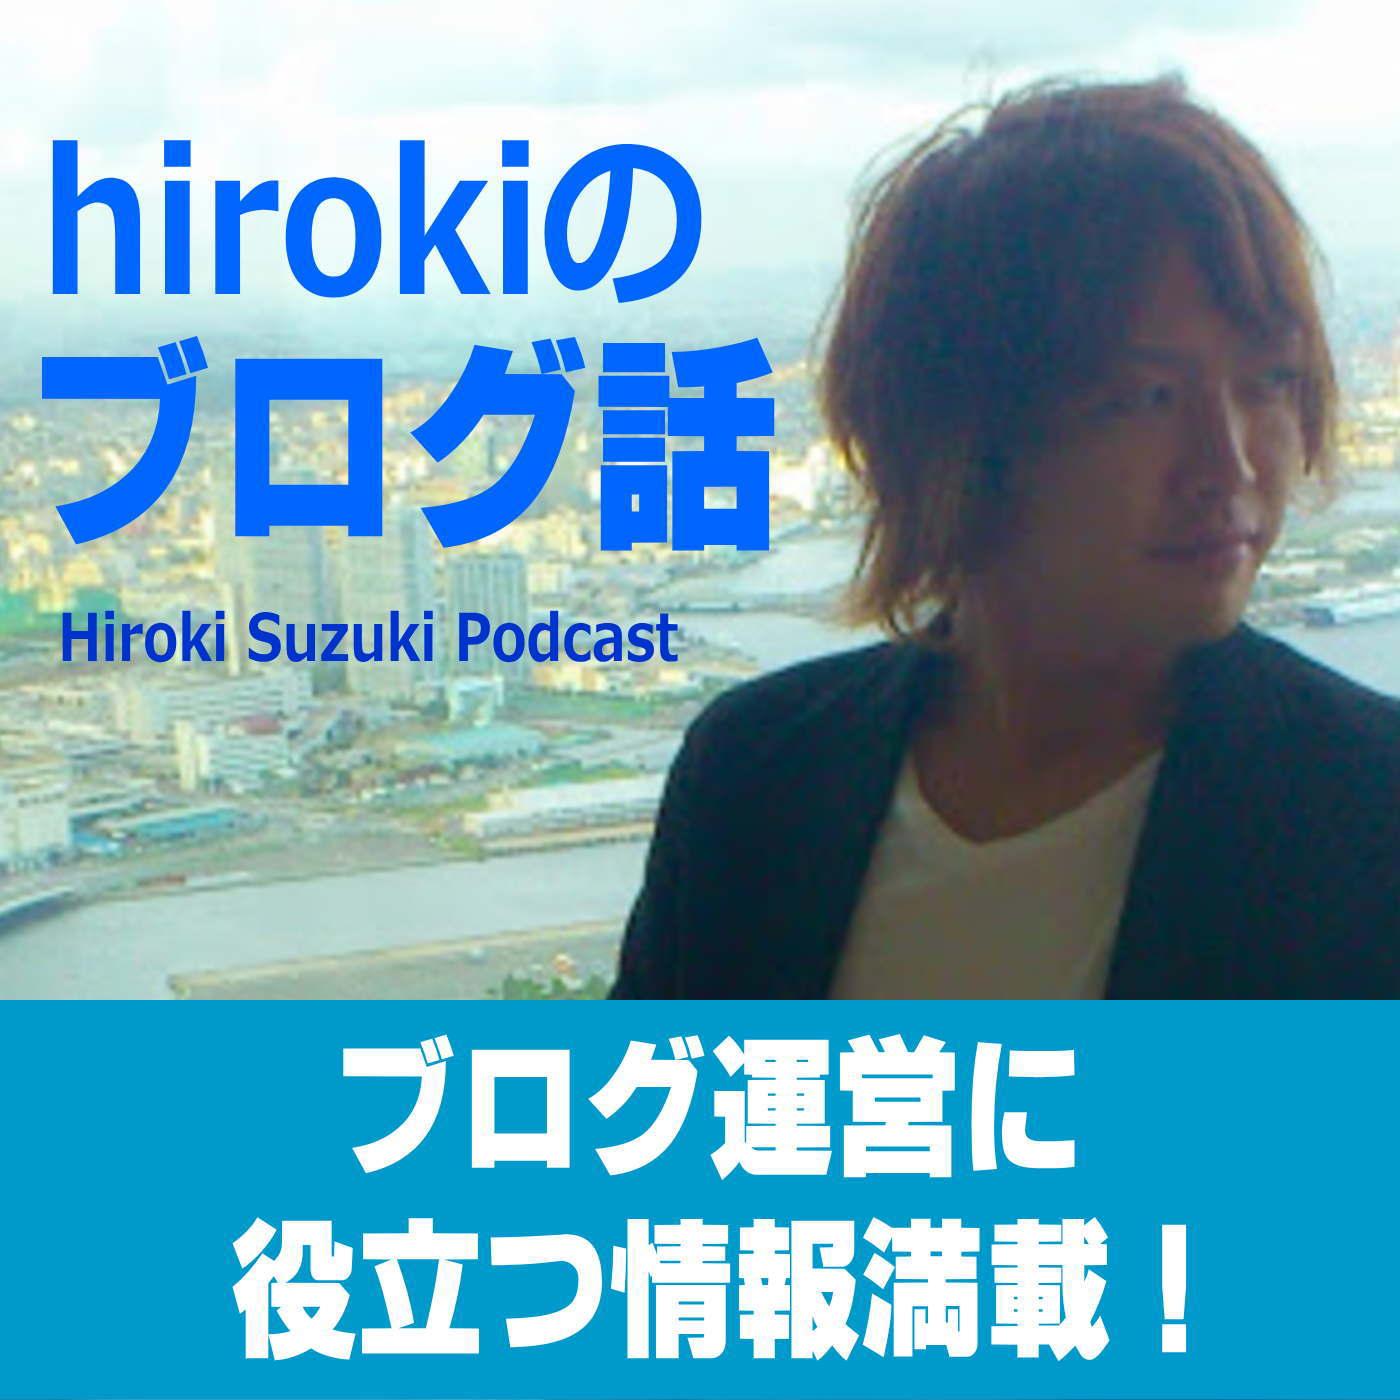 hirokiのブログ話